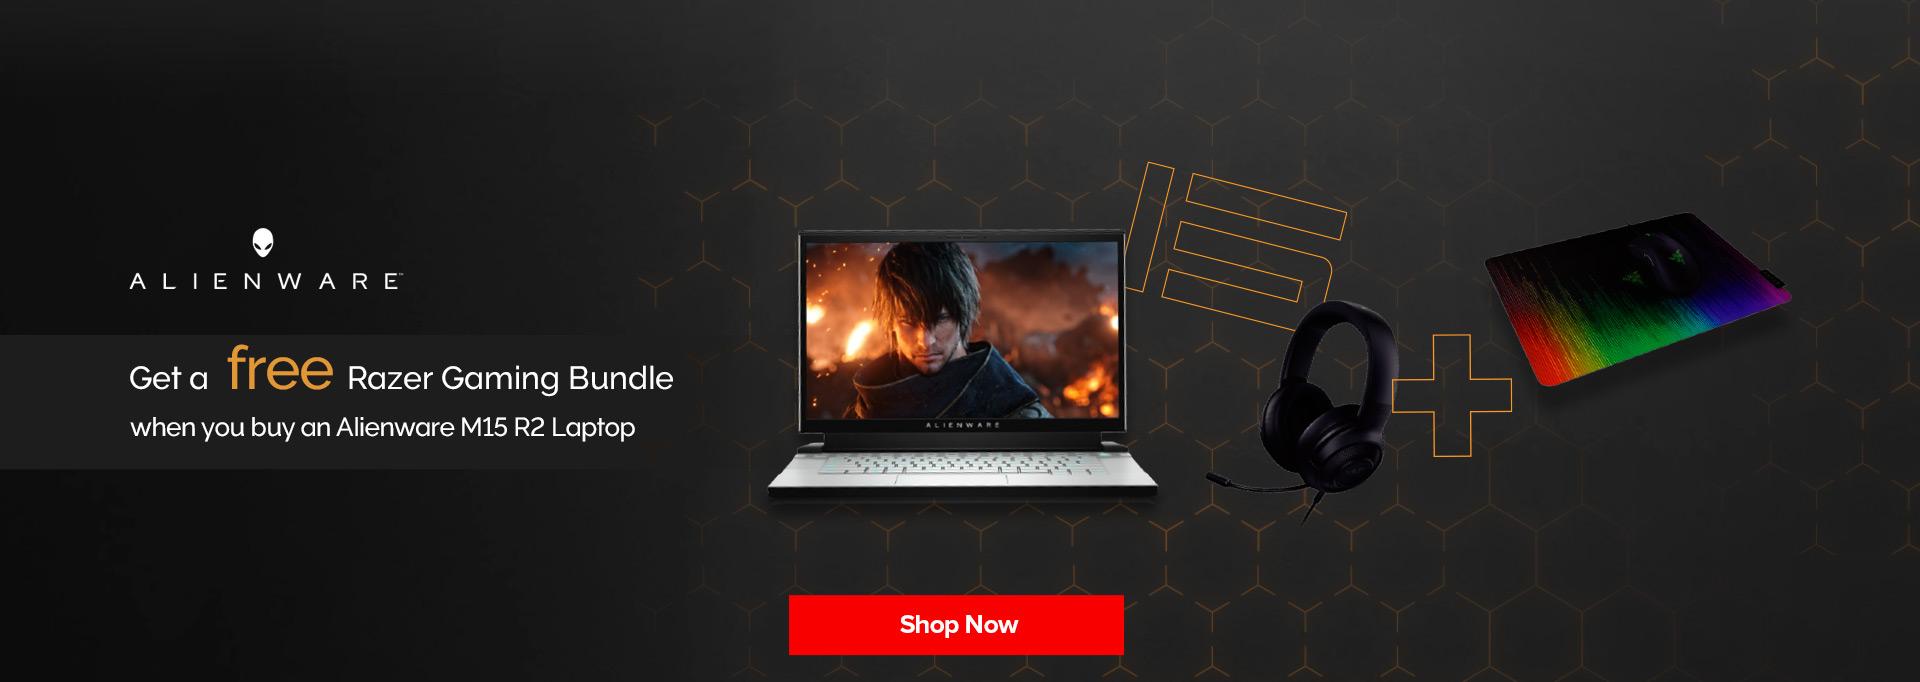 Alienware Promo